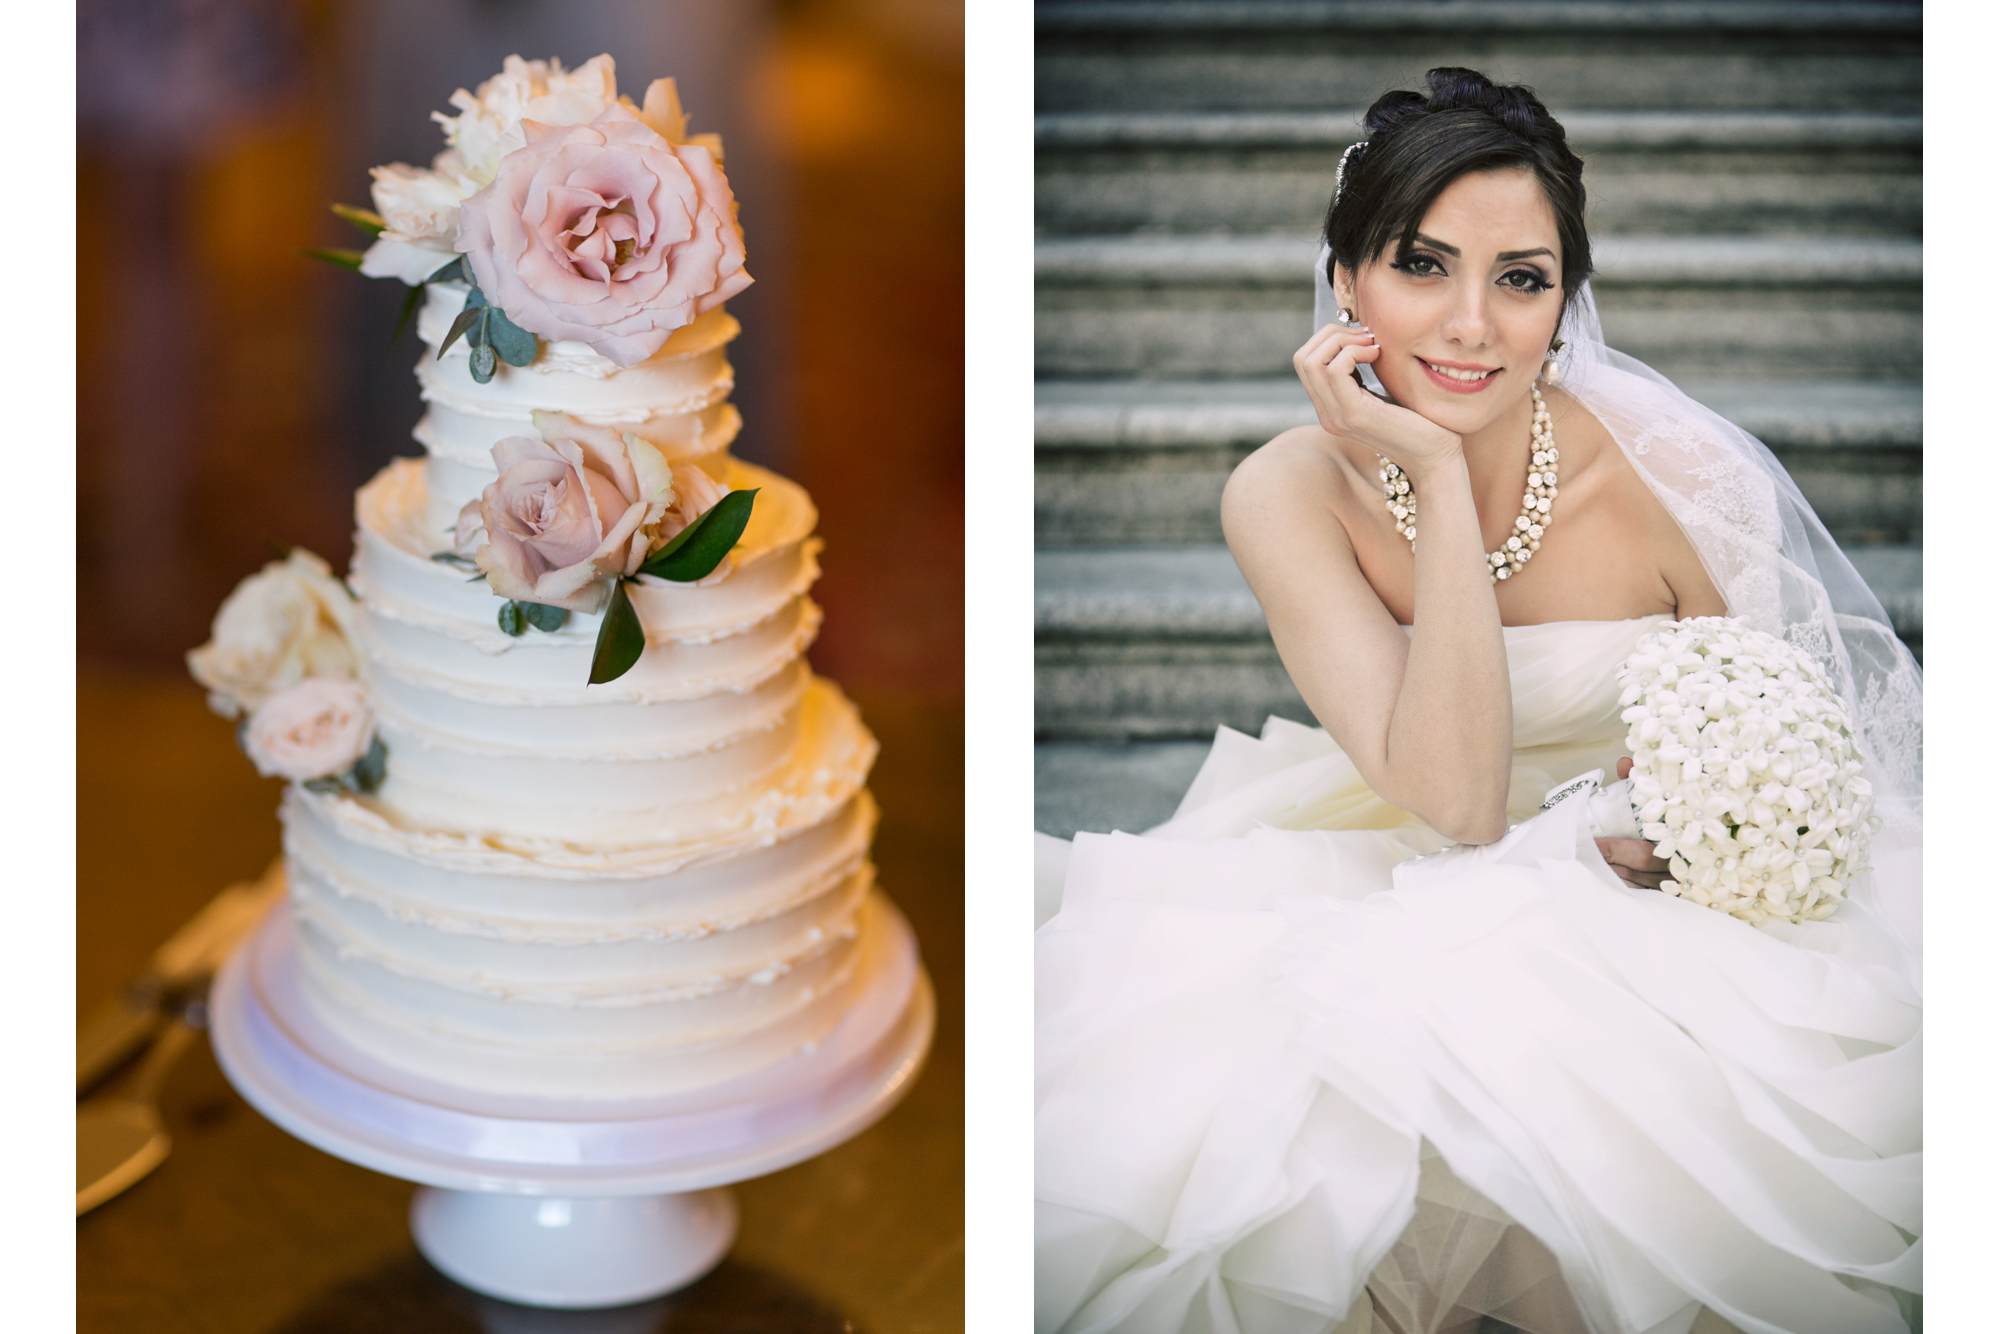 vancouver-luxury-wedding-photographer-lori-miles-4.jpg